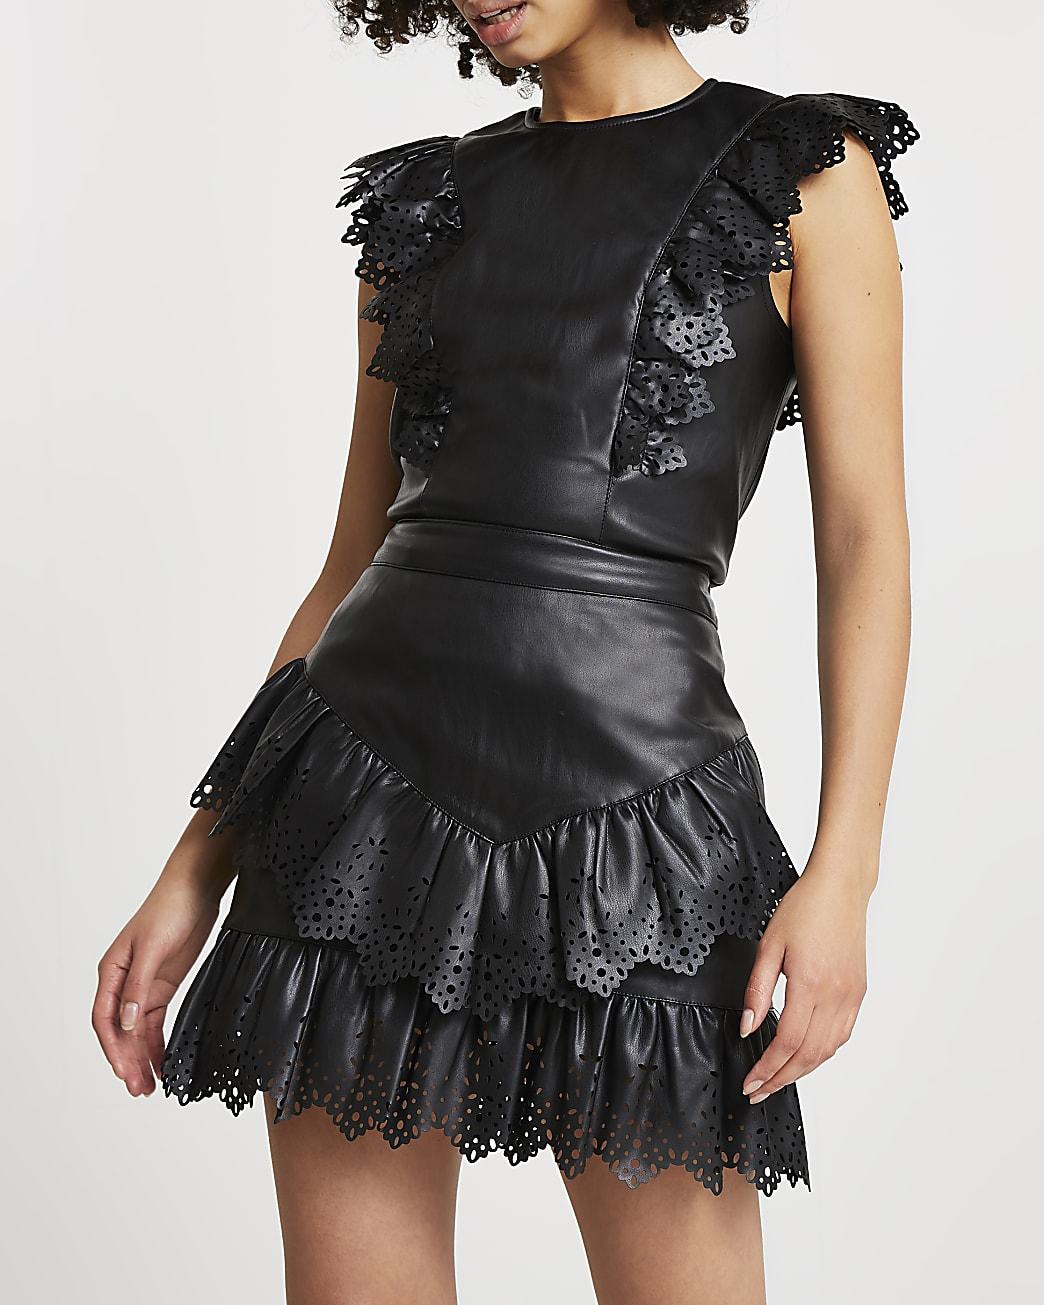 Black faux leather cutwork frill mini skirt